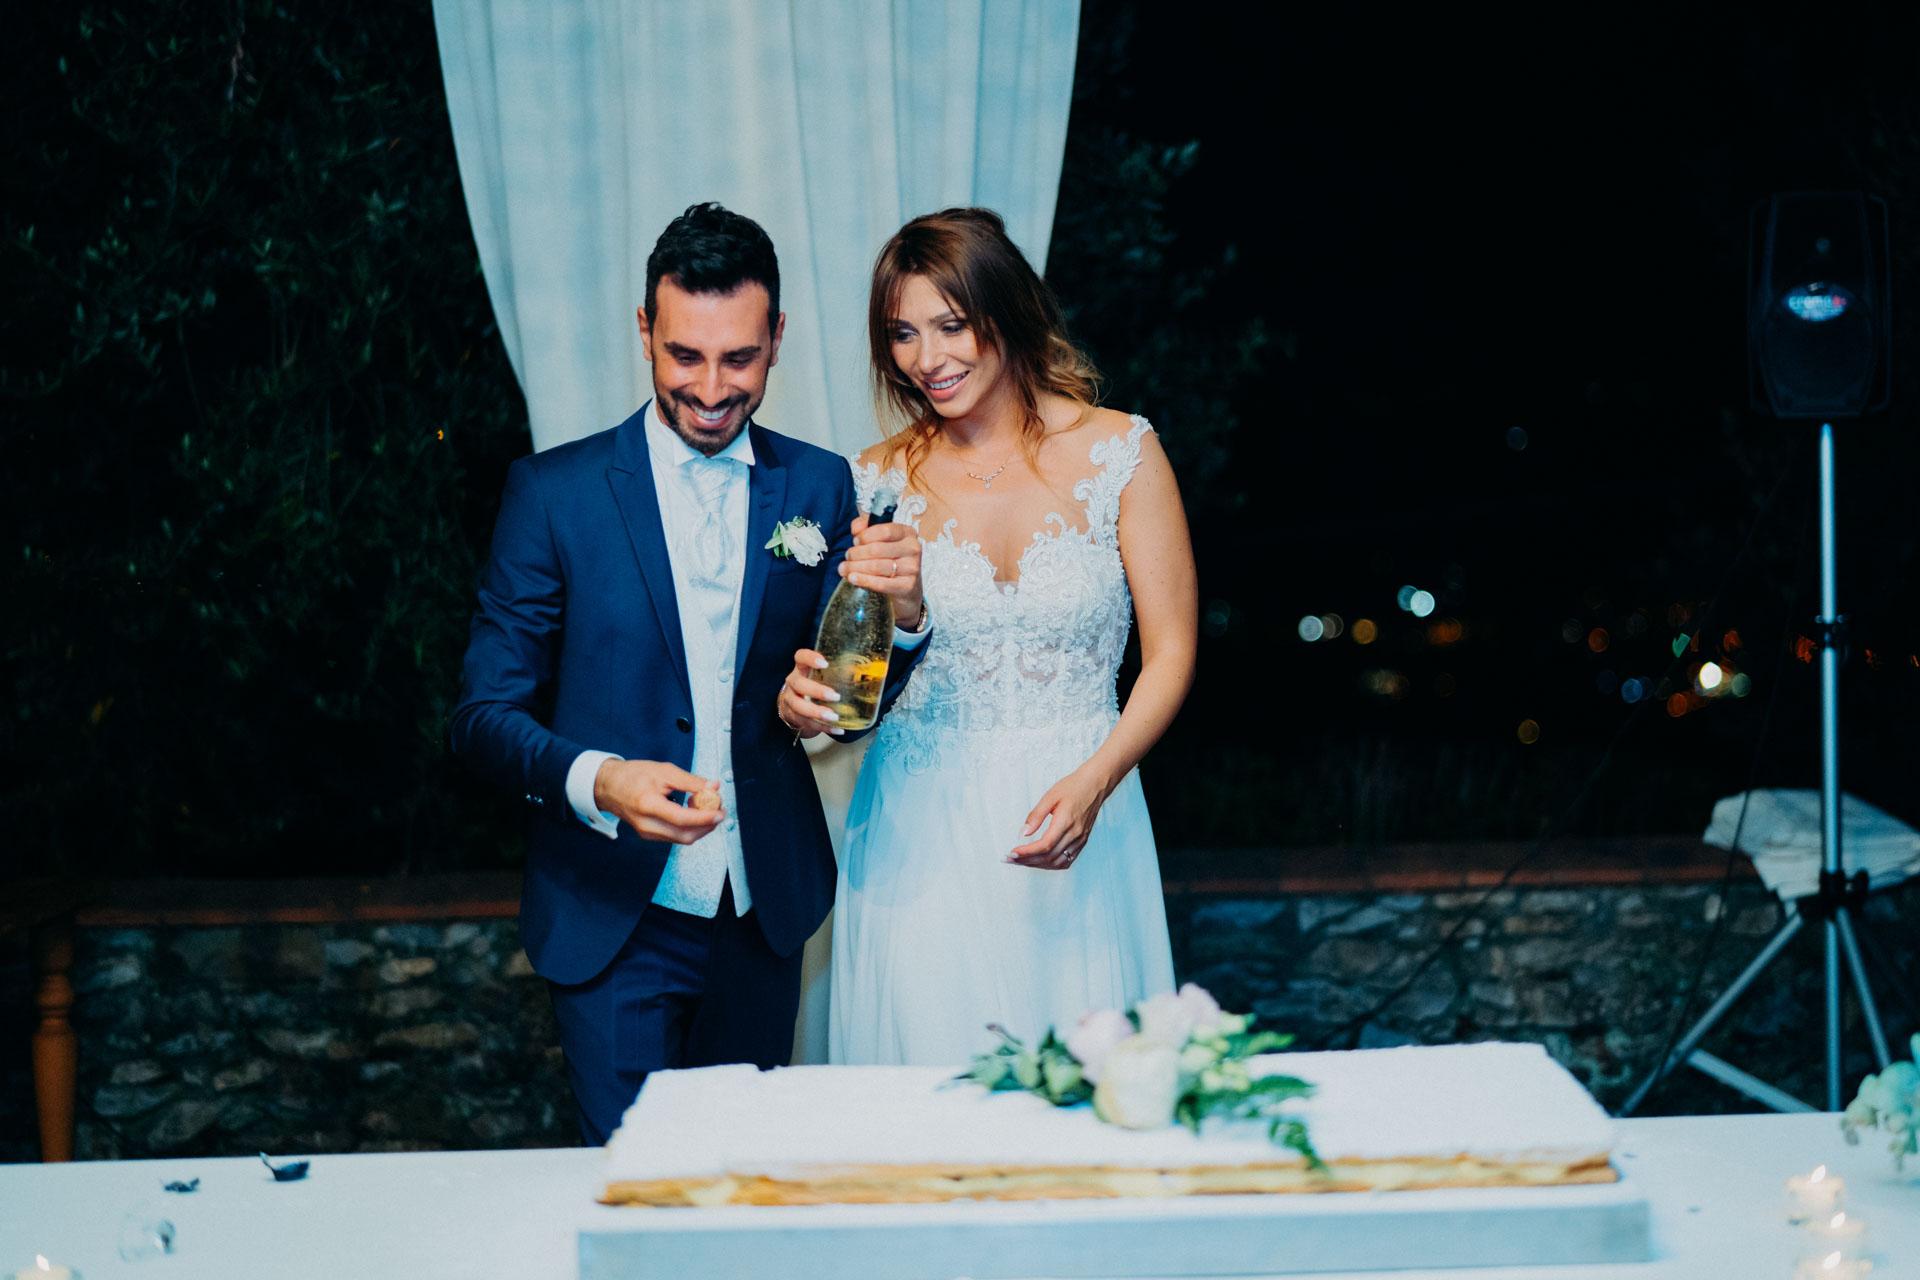 fotografo_matrimonio_toscana_poggio_tondo_112